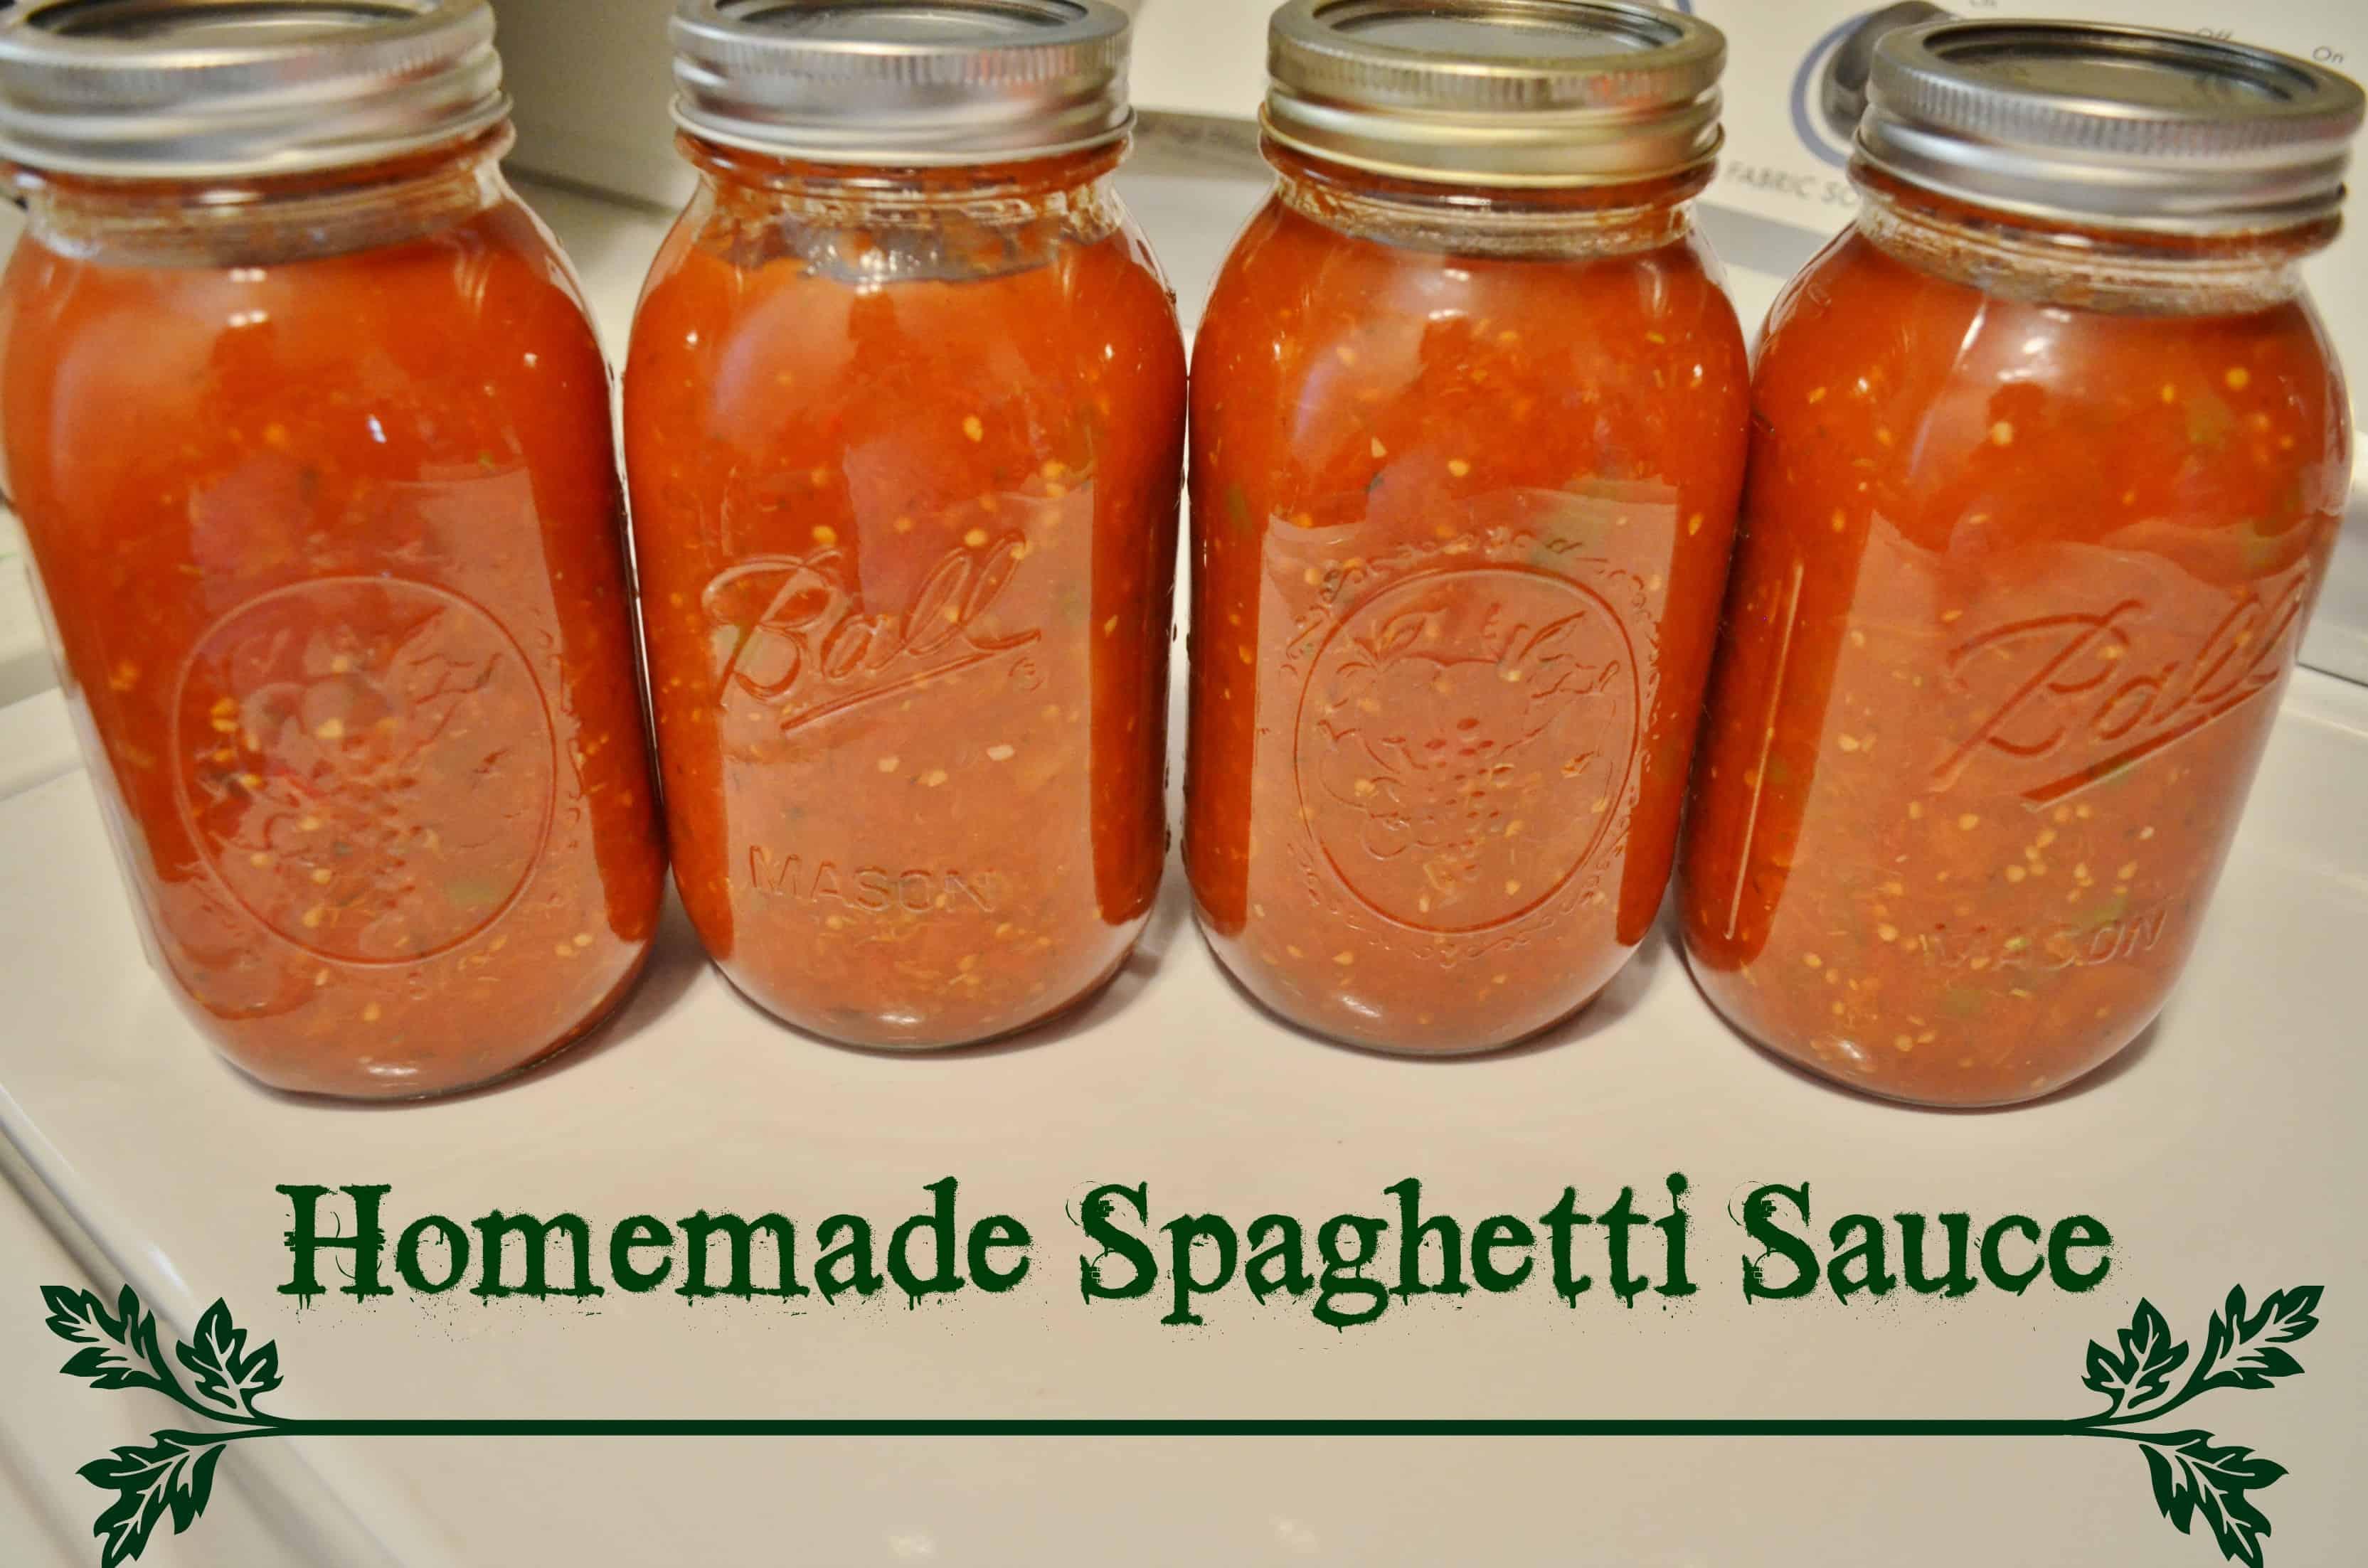 DIY Homemade Spaghetti Sauce Canning Recipe Tutorial